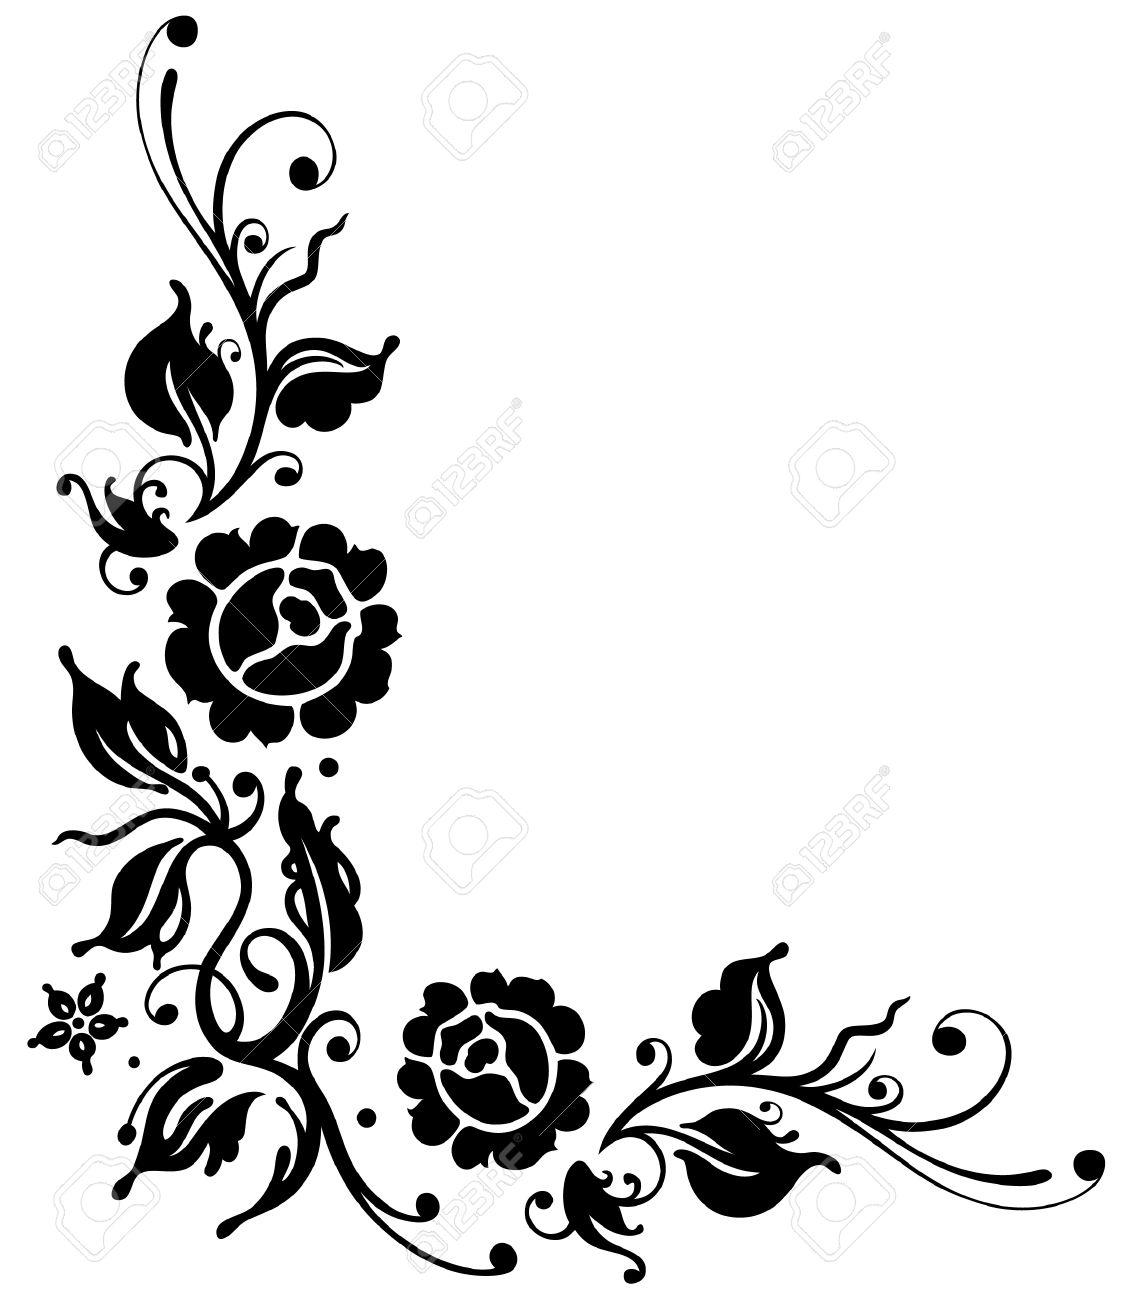 Black roses with leaves, border, vector illustration Standard-Bild - 22214485